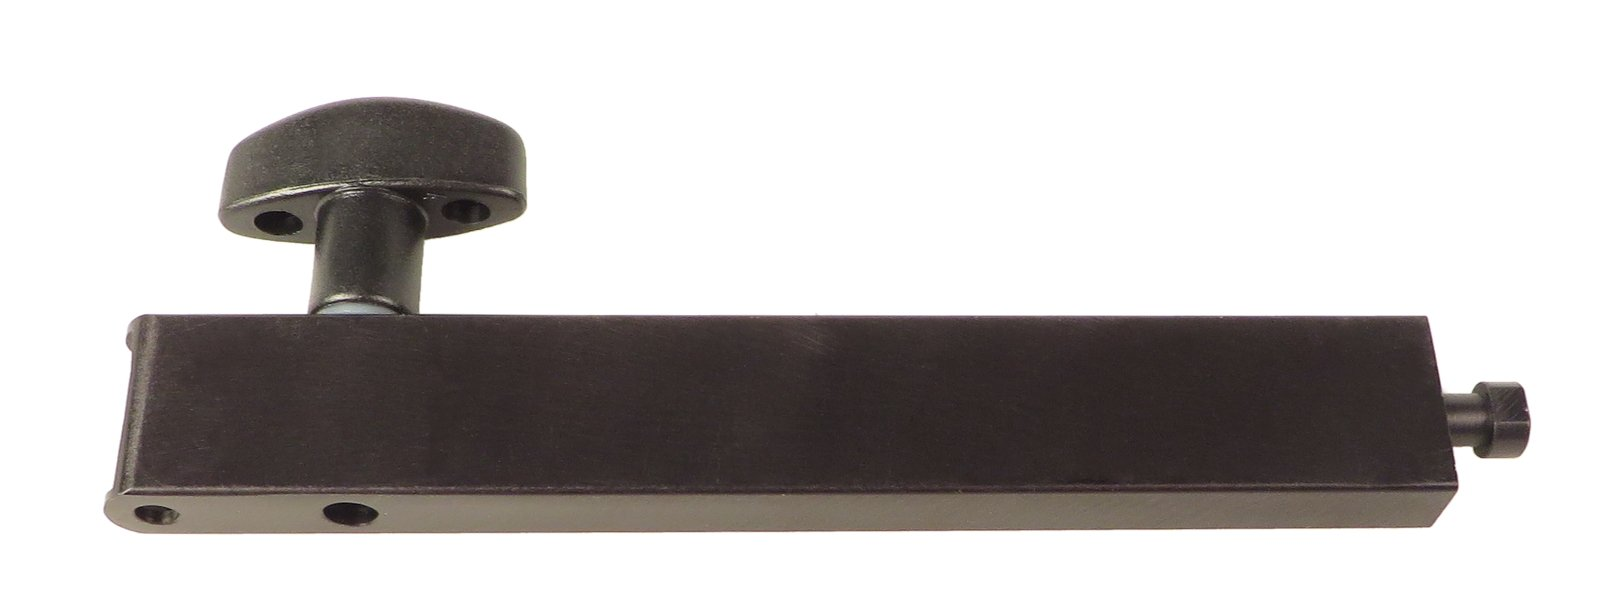 Strut Assembly for 4188 ENG 75/2D